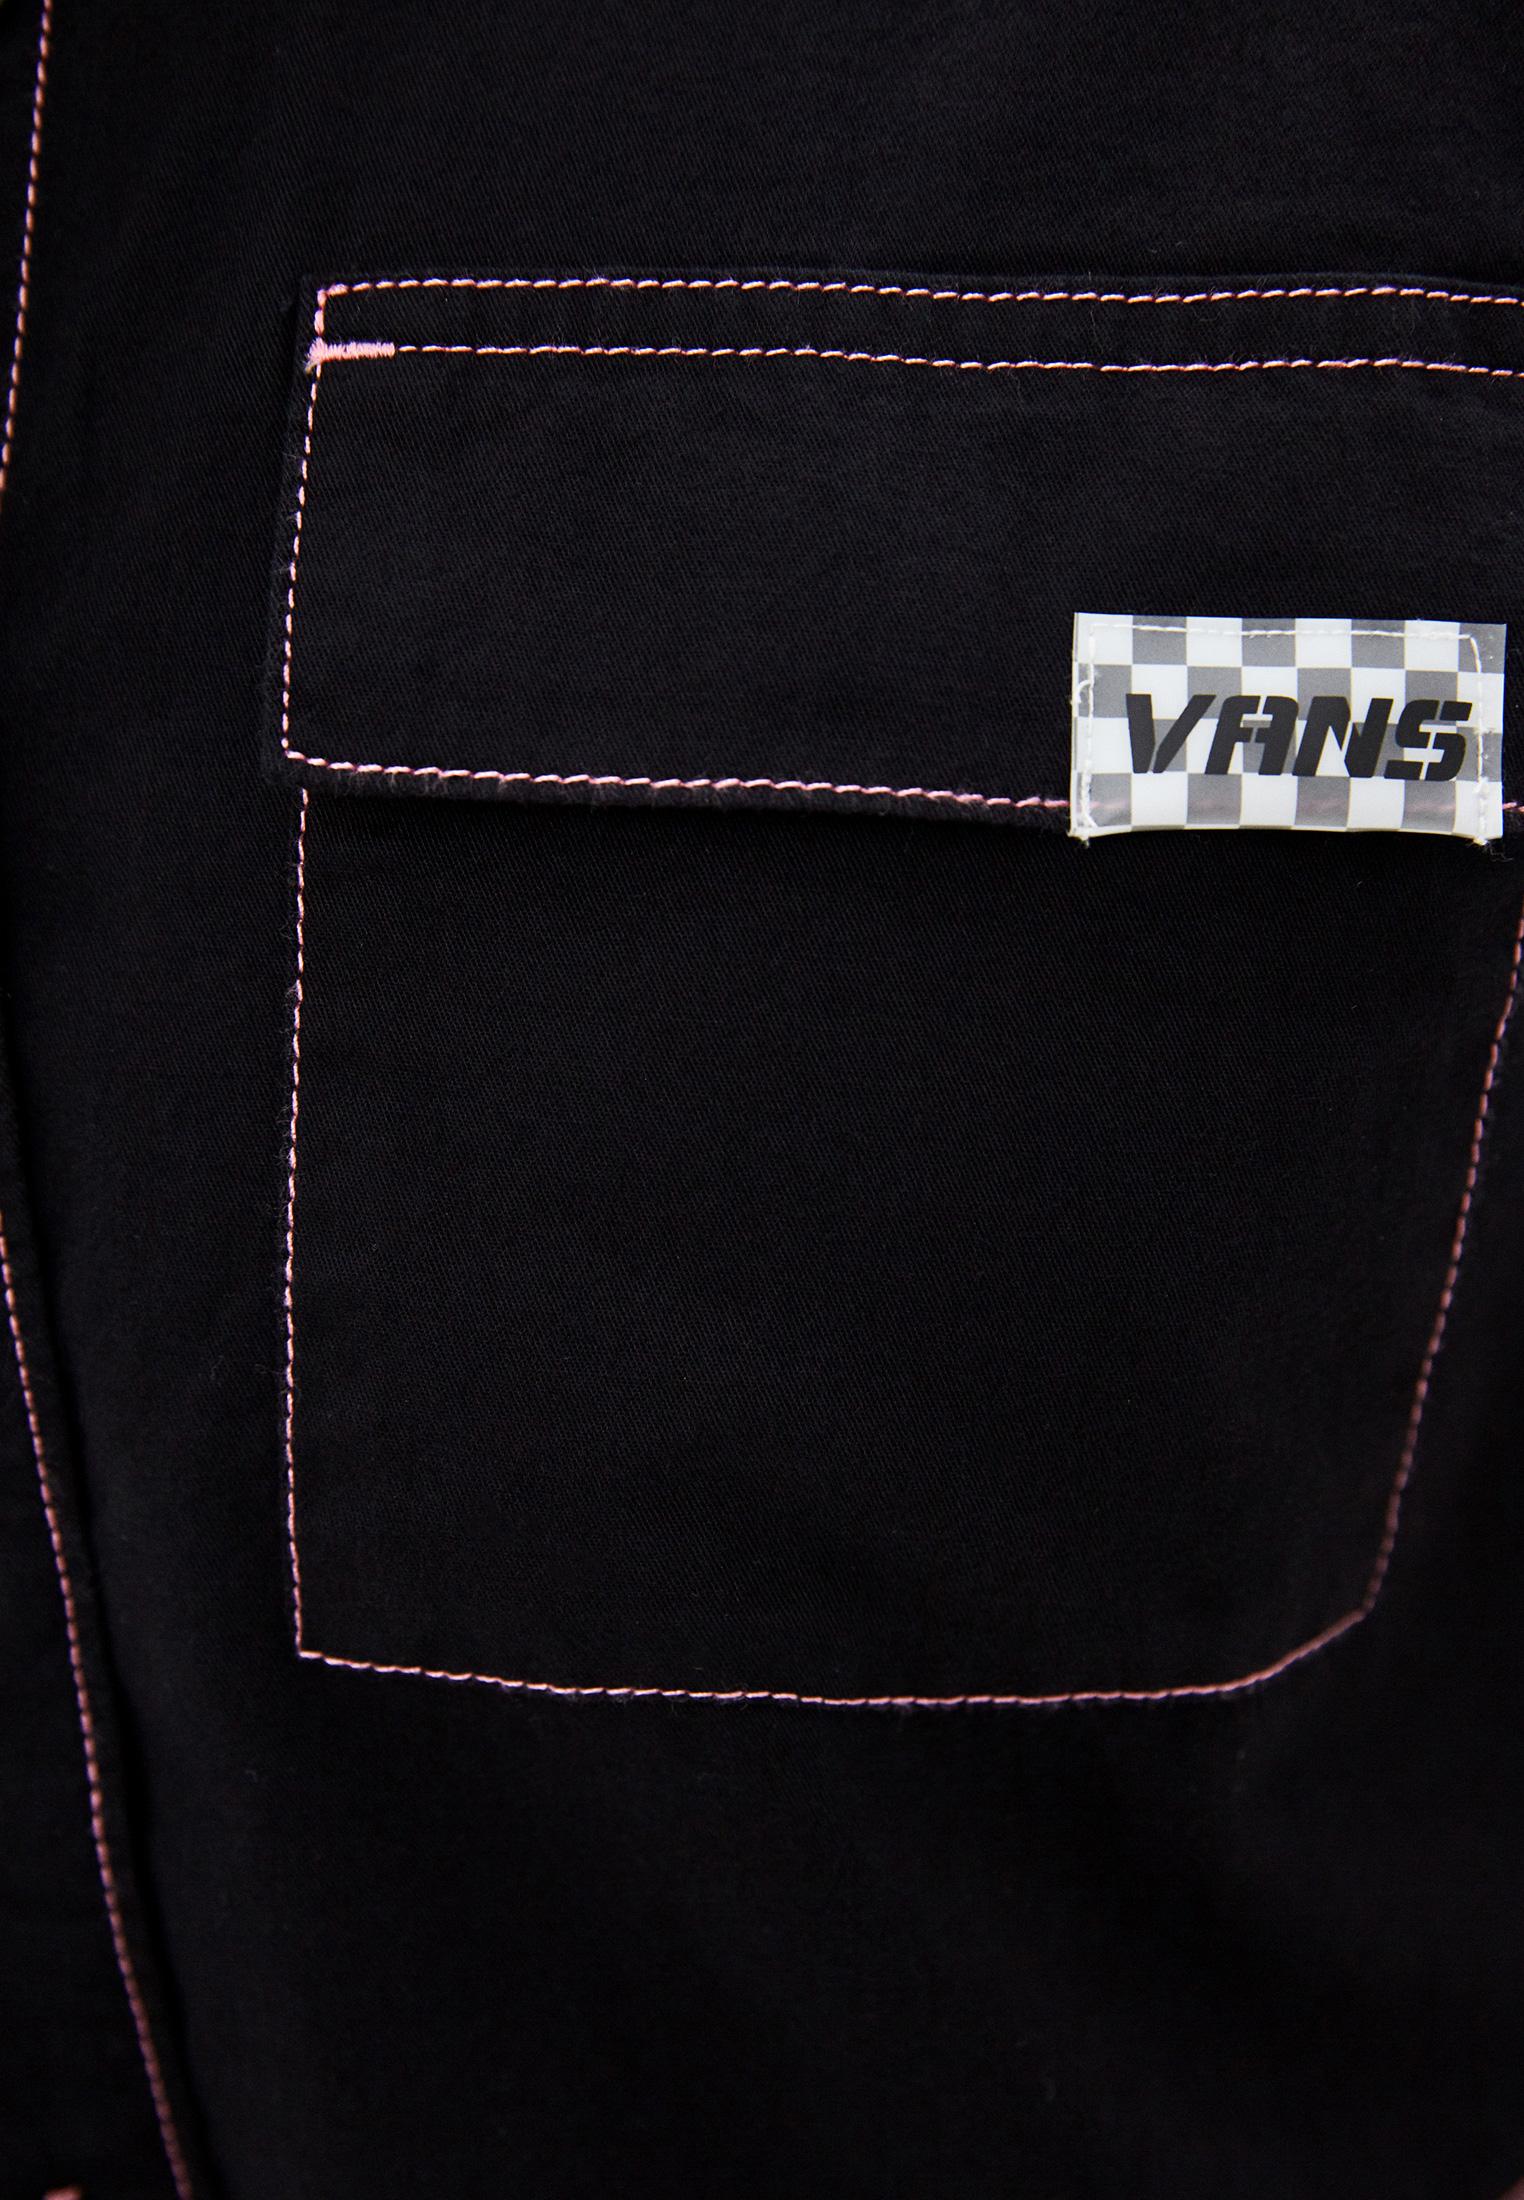 Рубашка с коротким рукавом VANS VA4MVGBLK: изображение 4